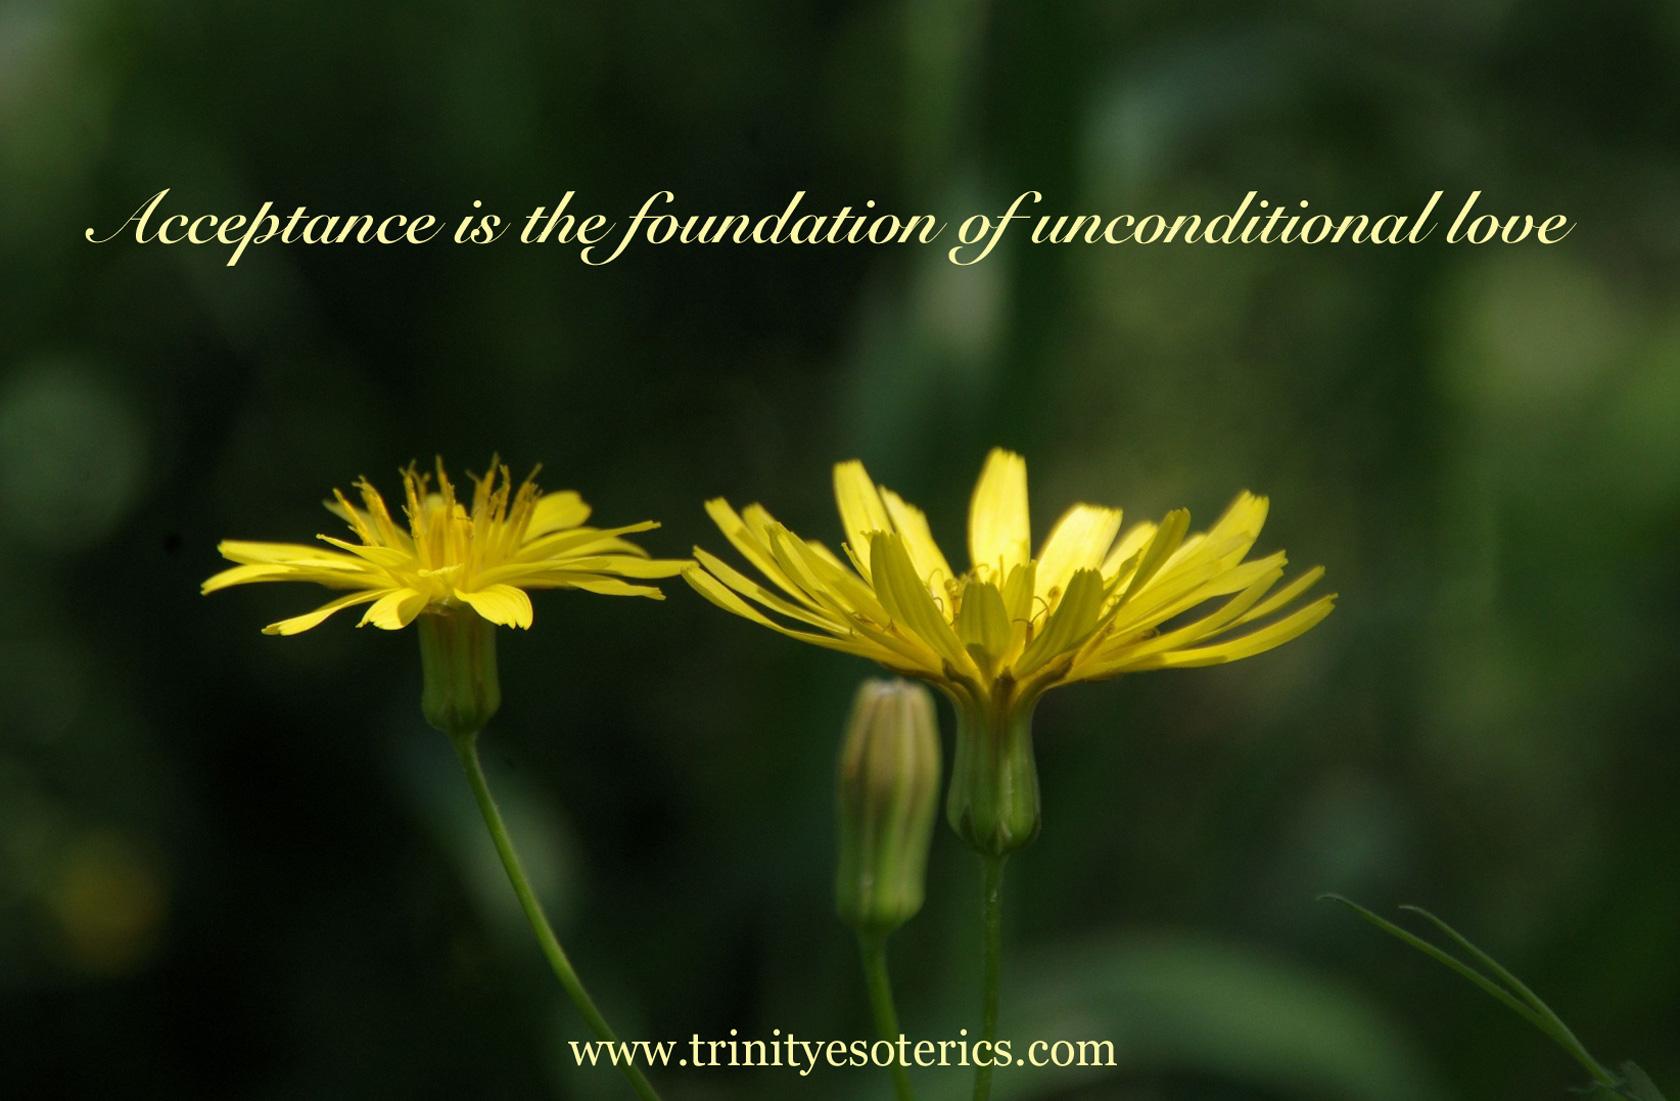 dandelion bloom trinity esoterics